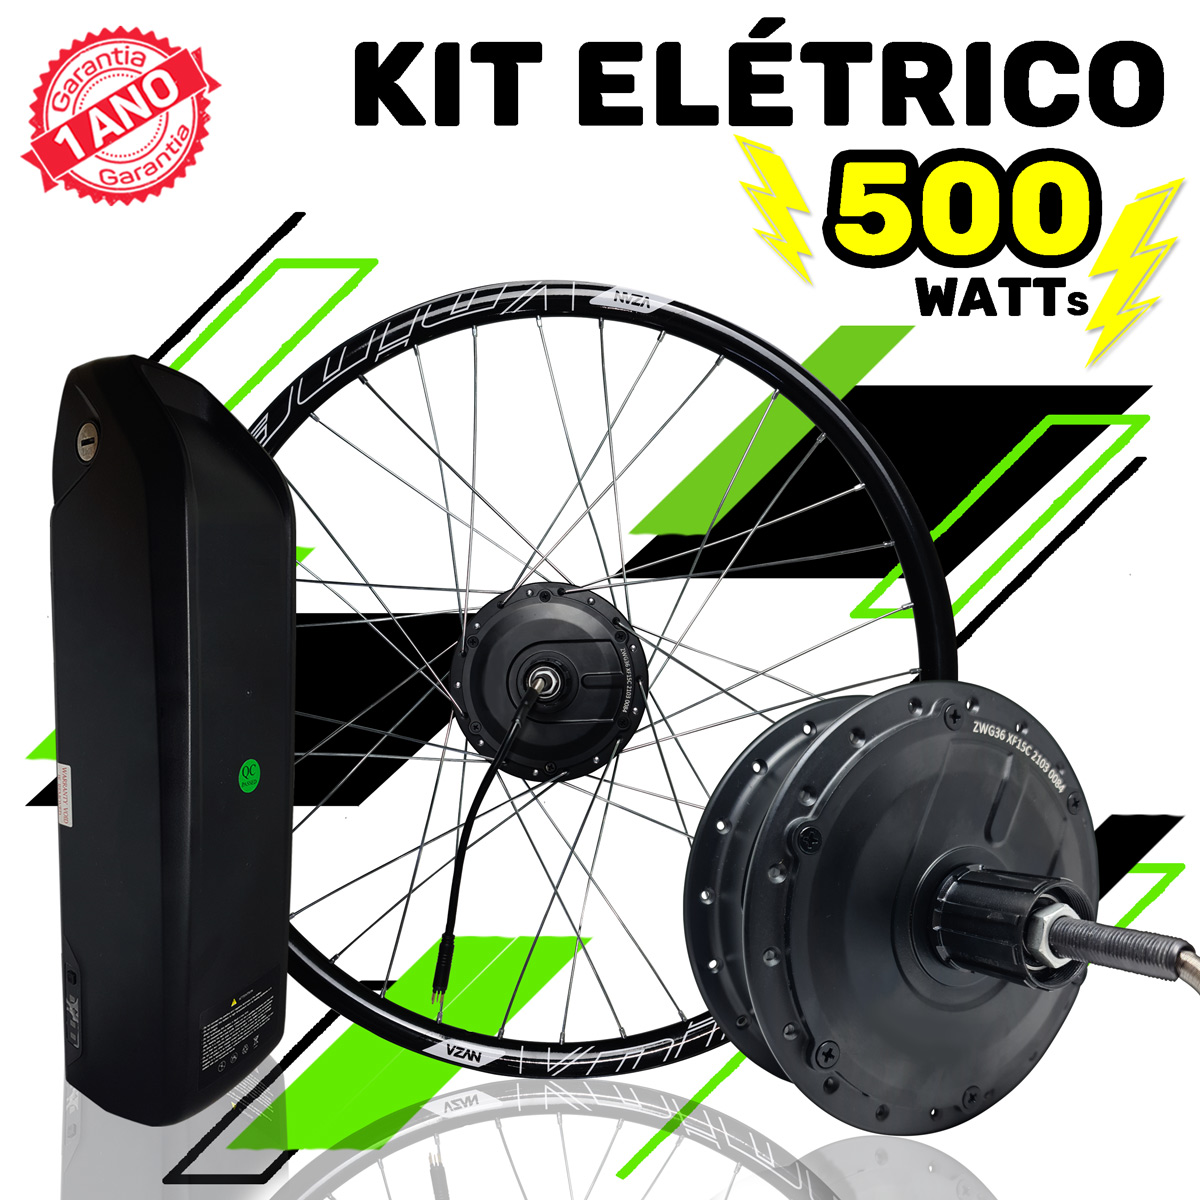 Kit Elétrico para Bicicleta - TecBike - 500 Watts 36V - Aro 20